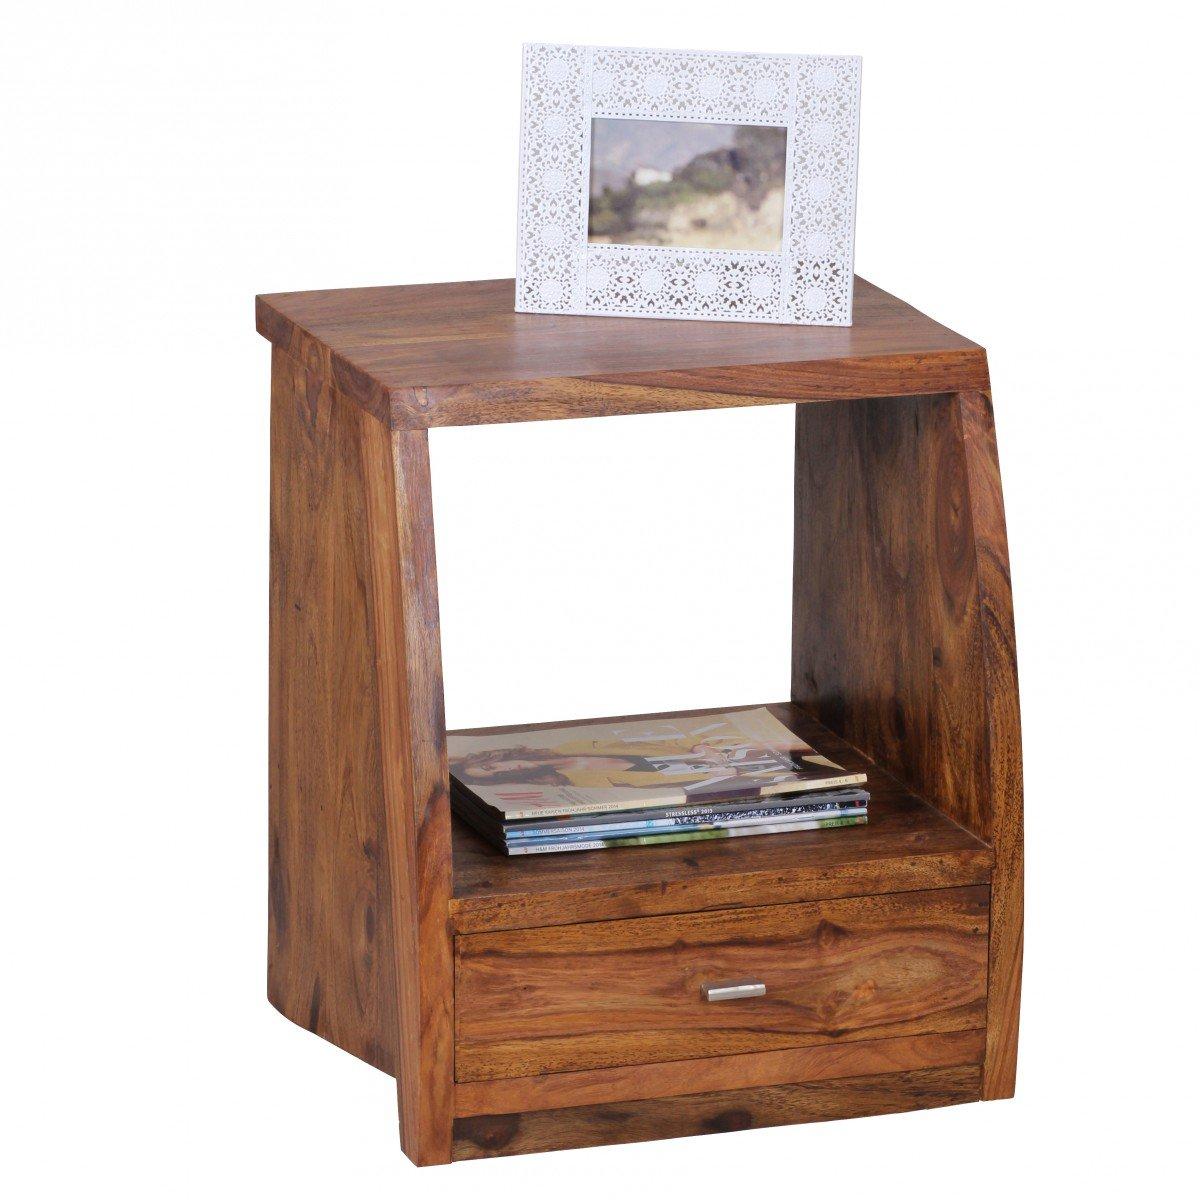 KadimaDesign Sheesham Comodino Legno massello con 1 cassetto e Vassoio 45 x 53 x 40 cm KADIMA DESIGN